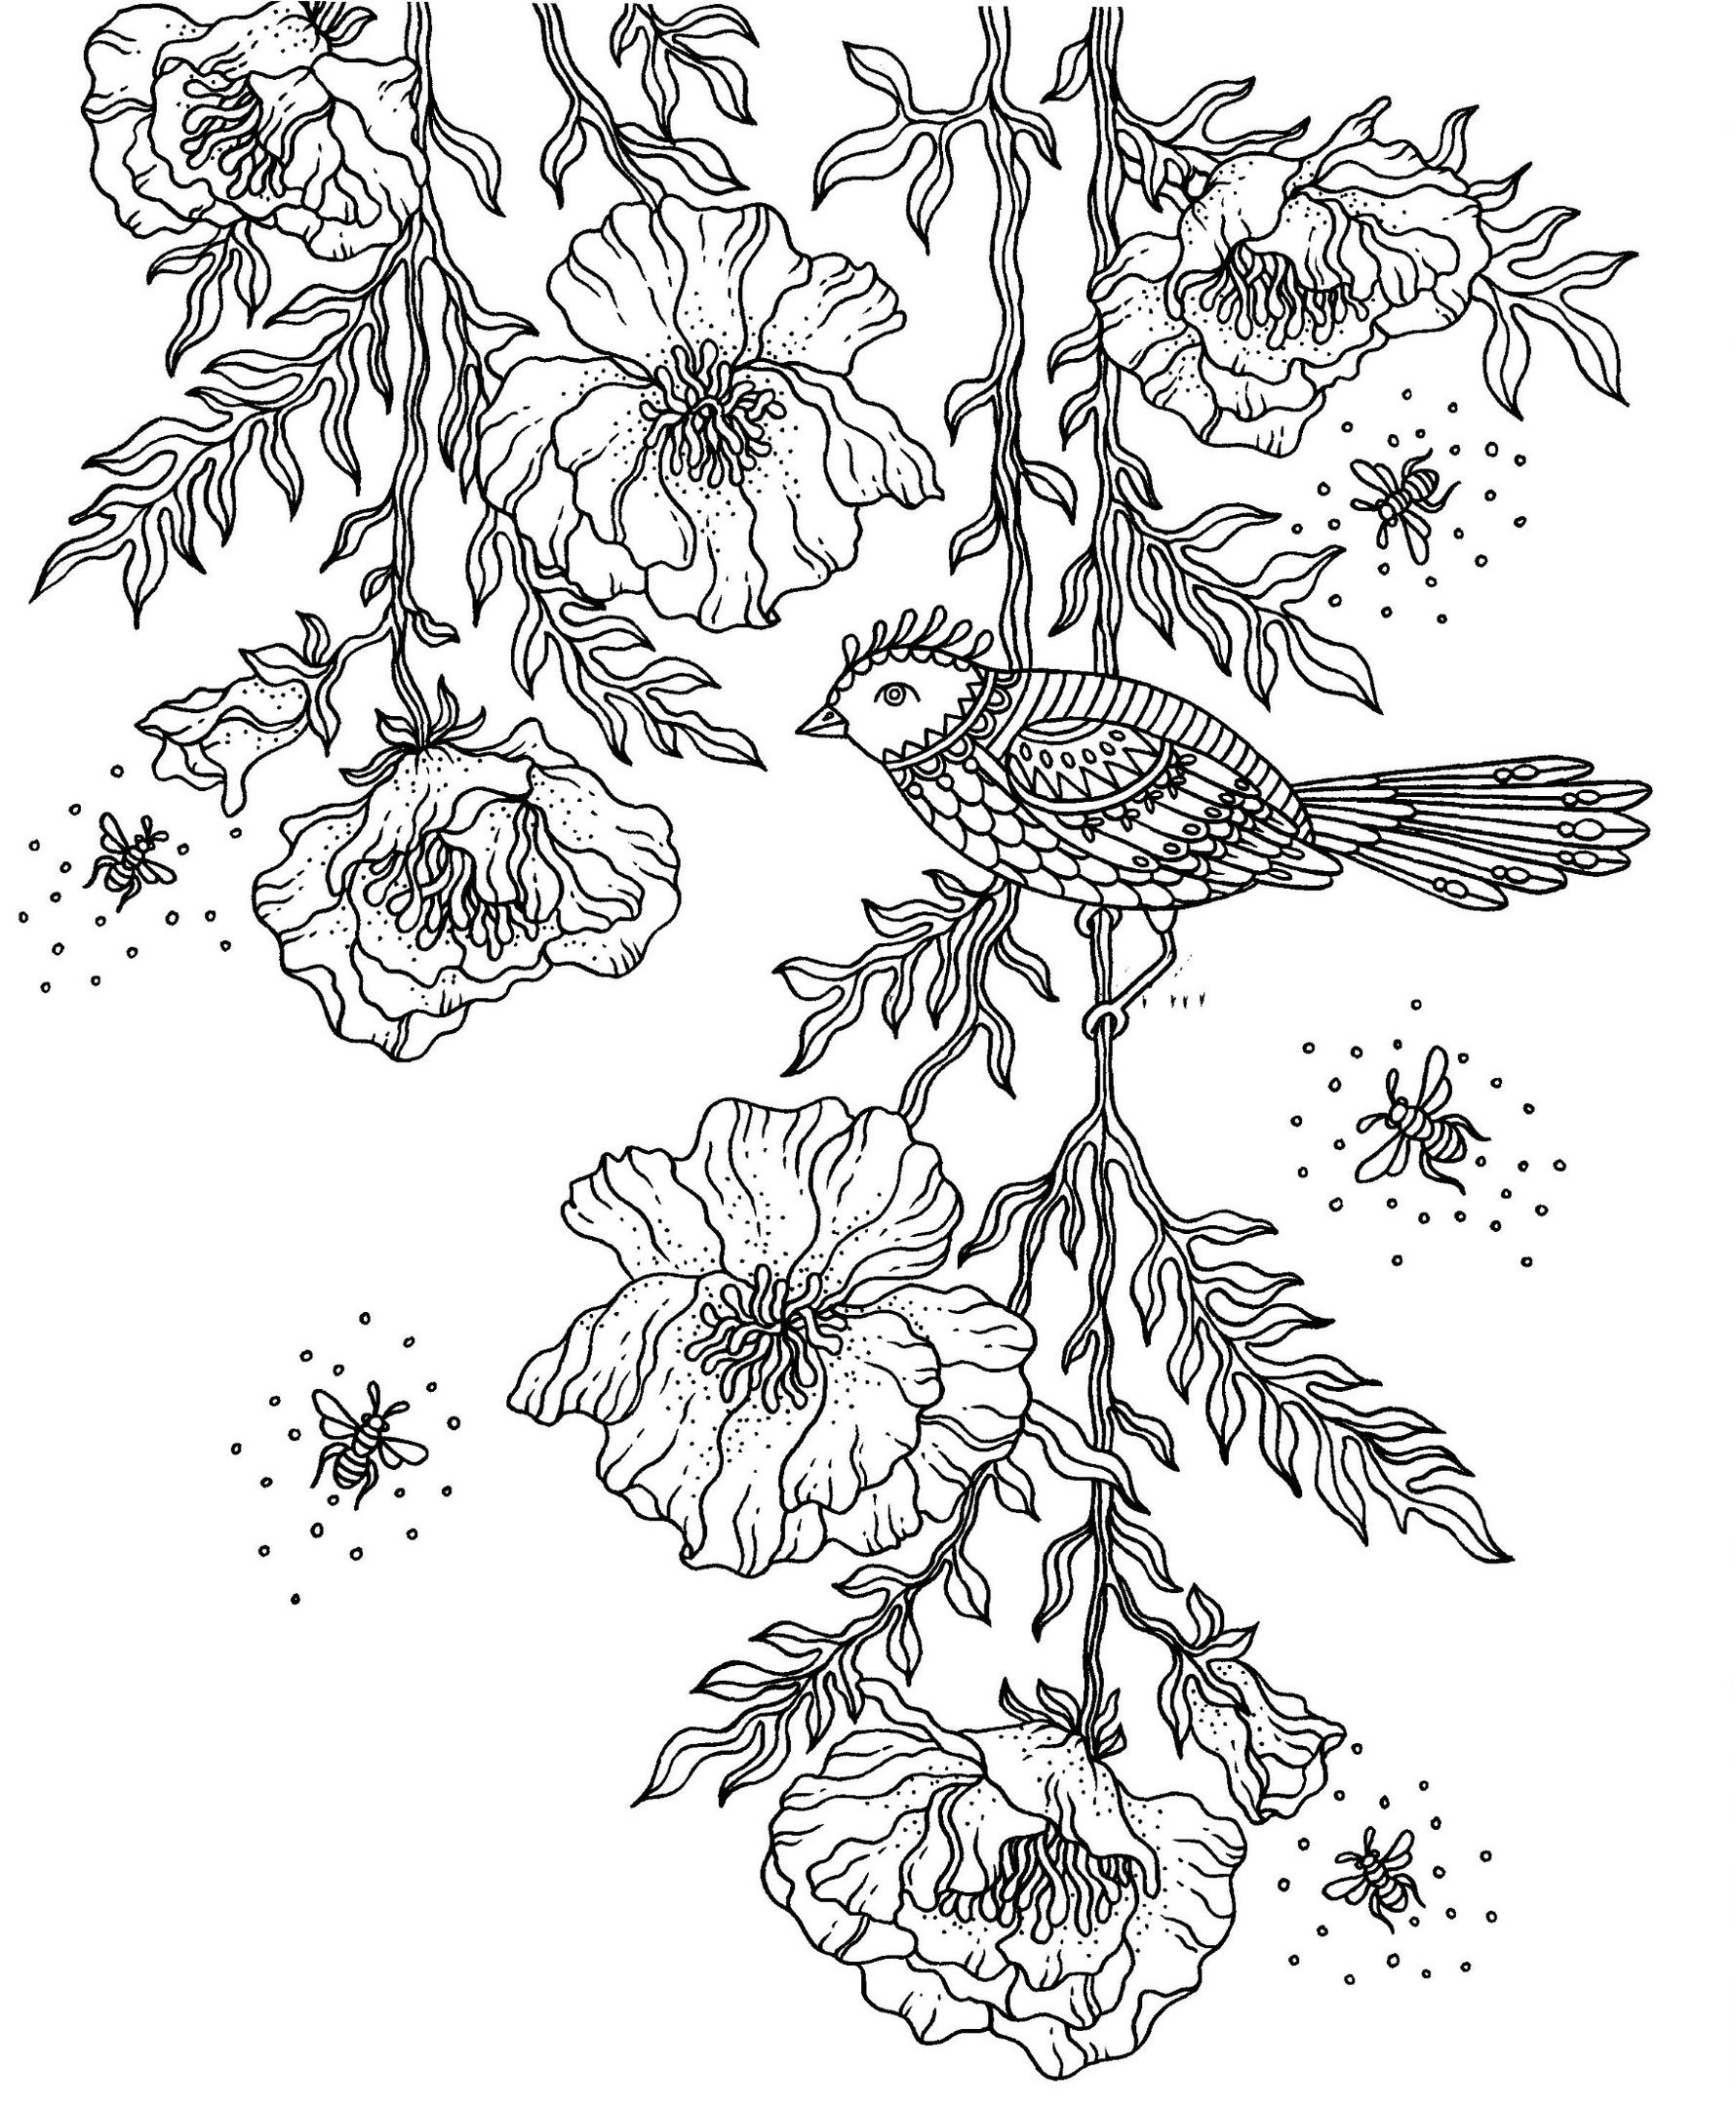 Птица на маках - Птицы - Раскраски антистресс